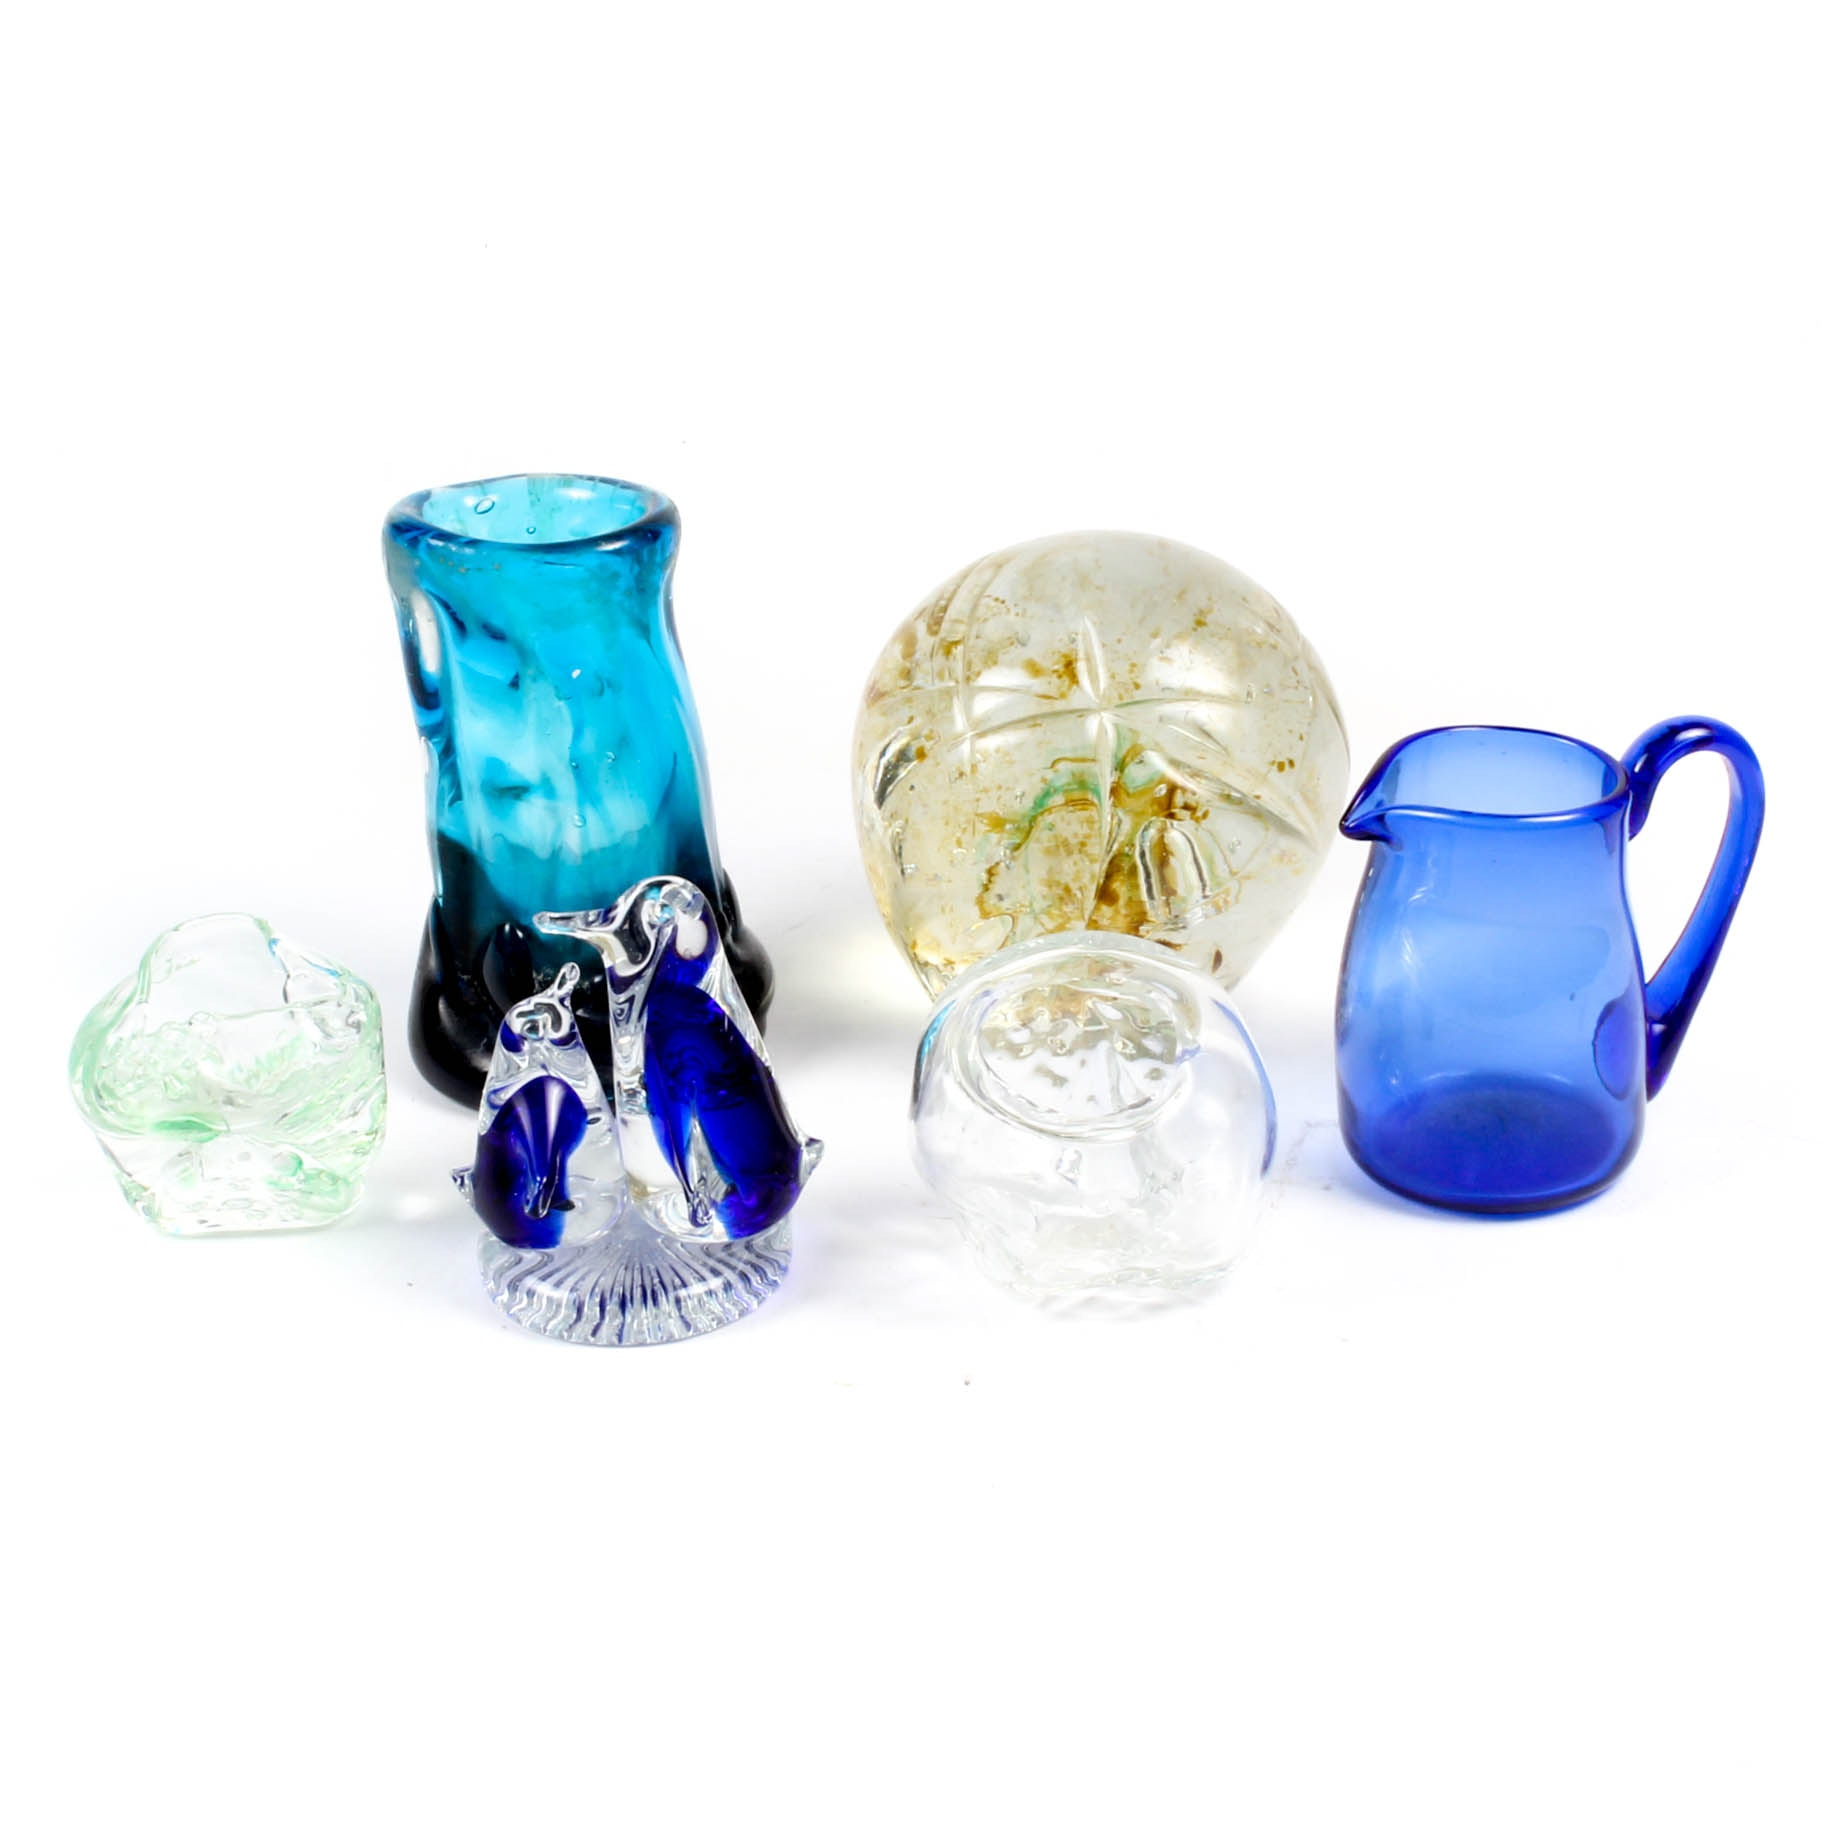 Art Glass Vases and Decor